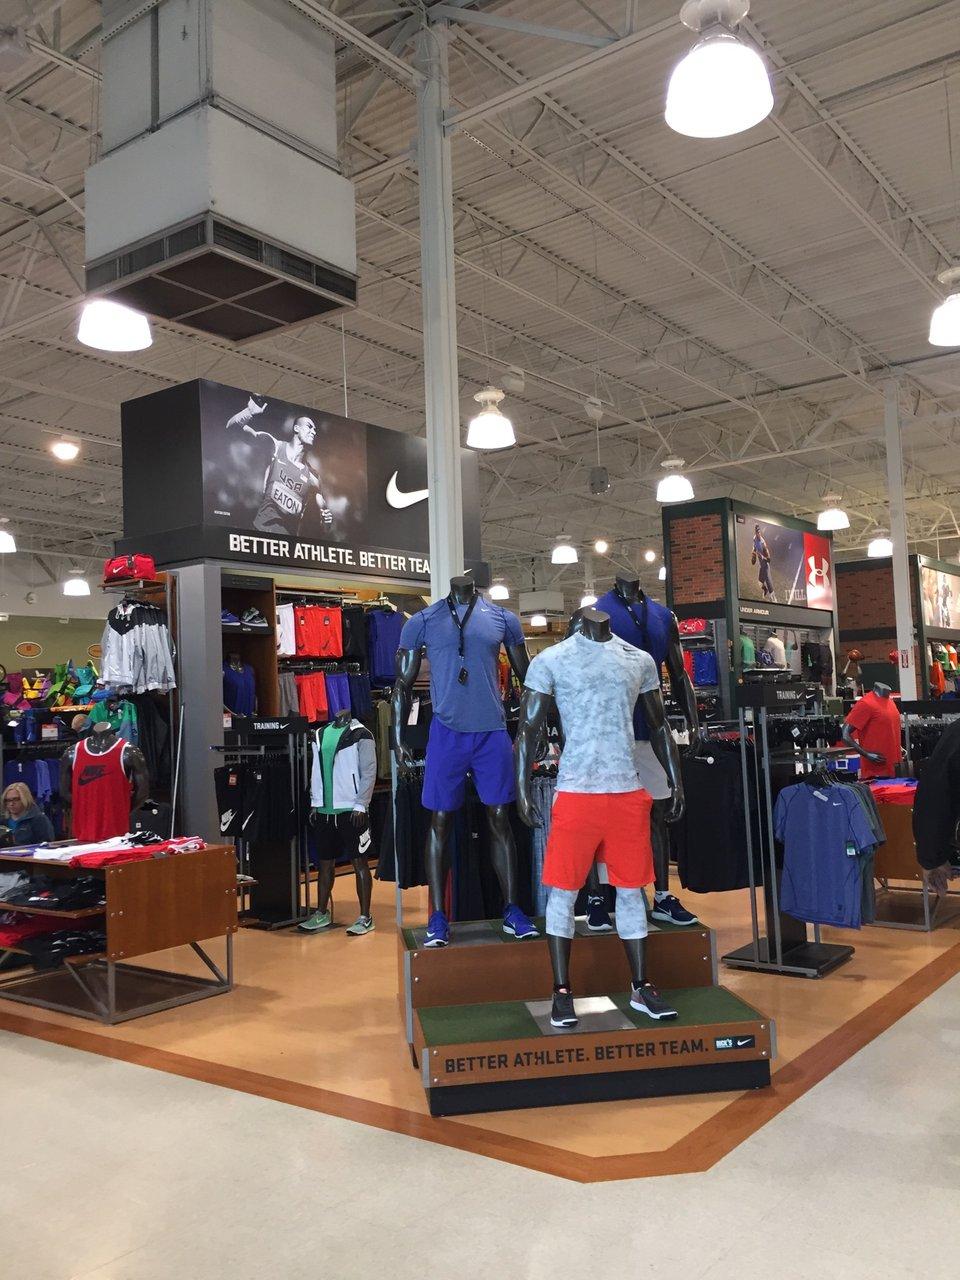 DICK'S Sporting Goods 2615 Medical Center Pkwy, Murfreesboro